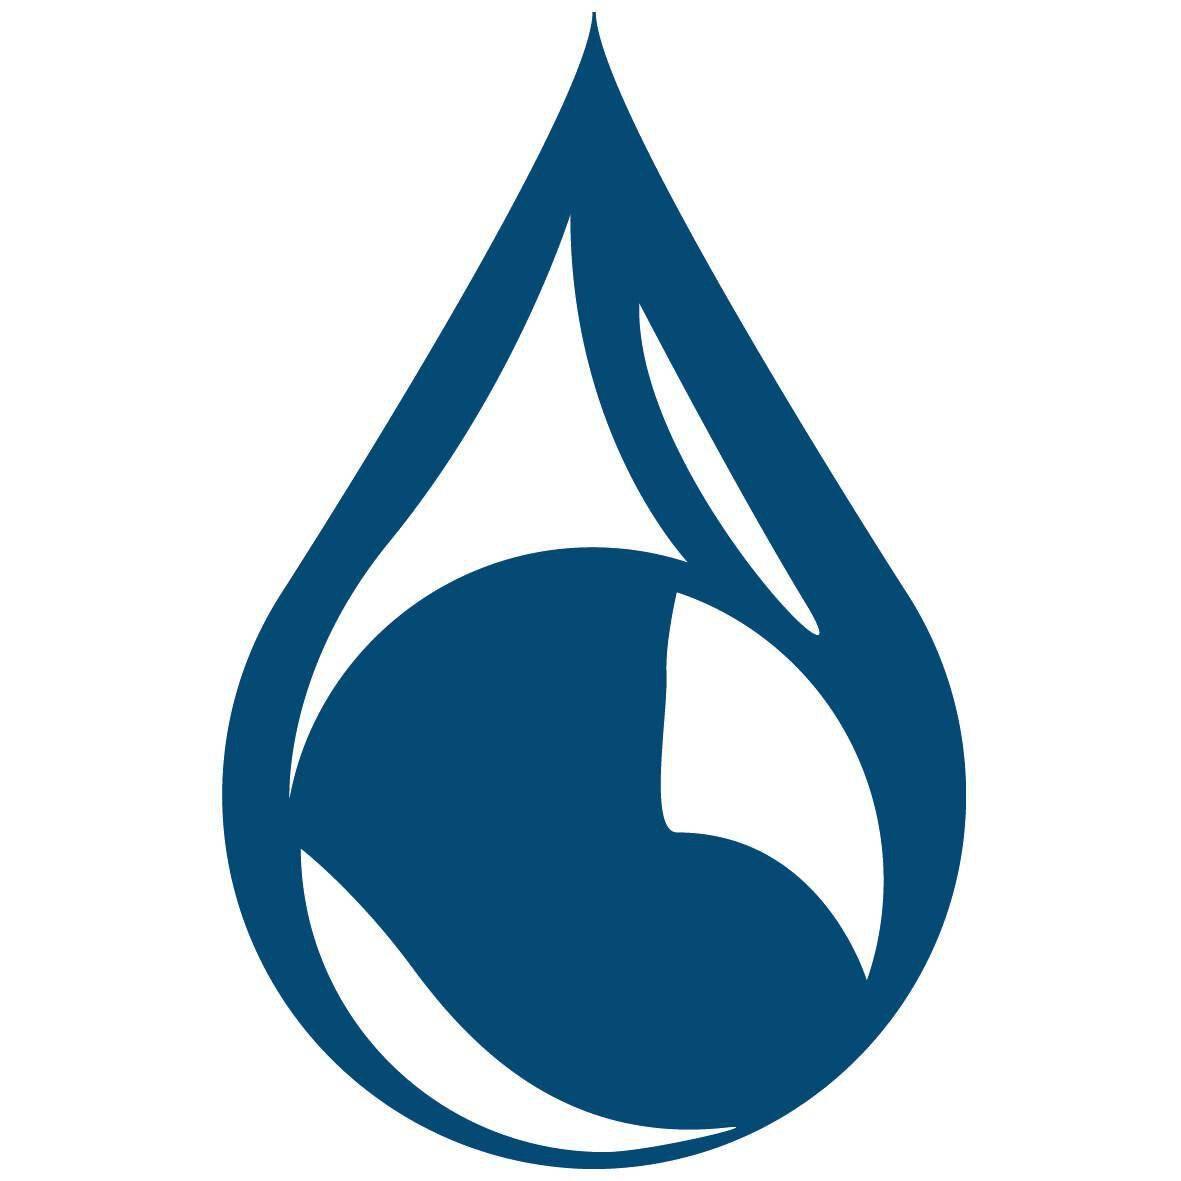 Company logo of GWE pumpenboese GmbH